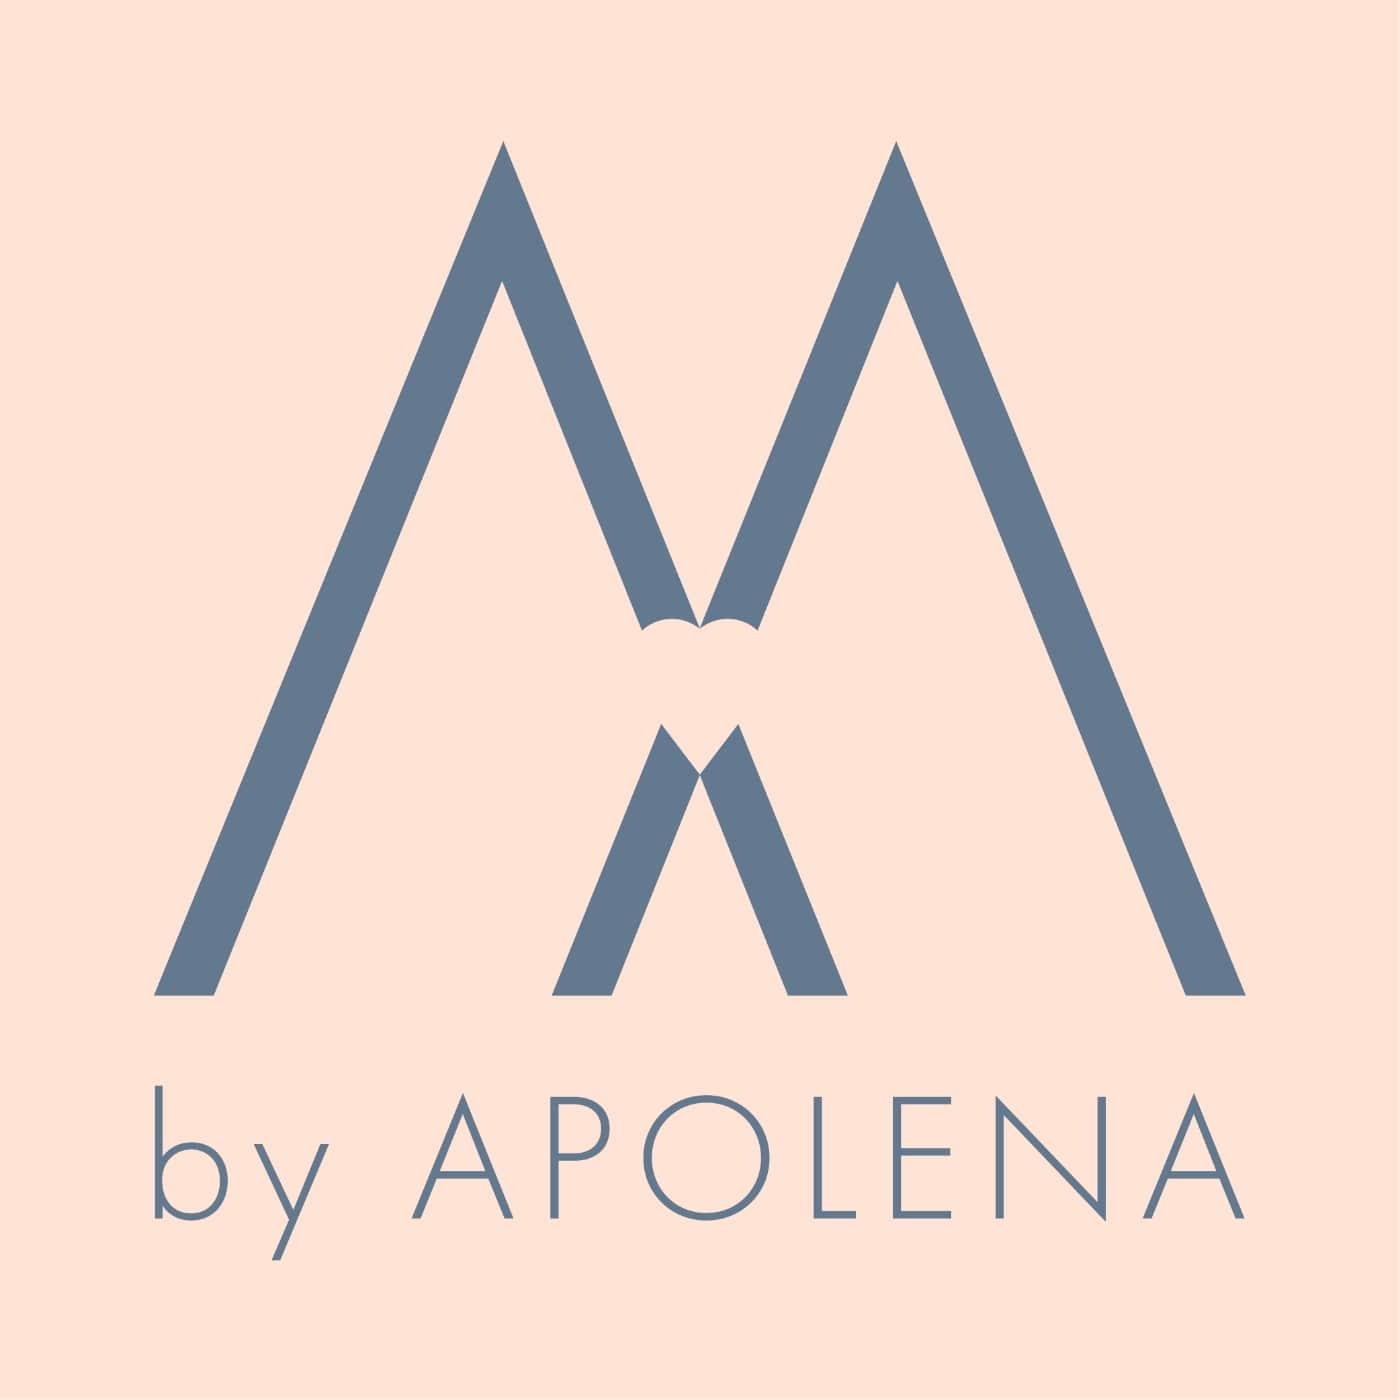 by APOLENA logo